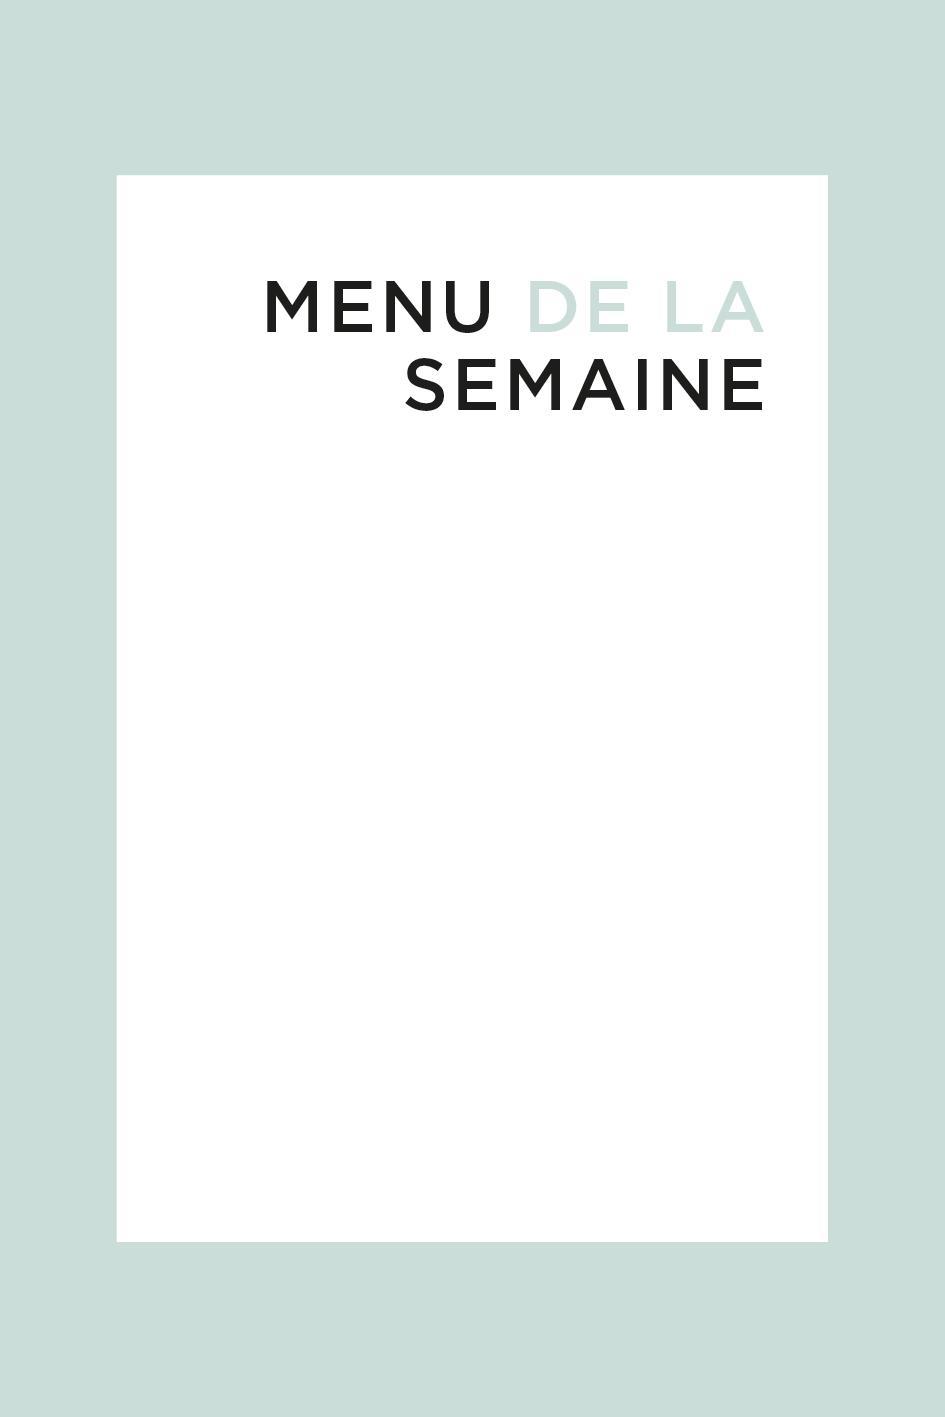 MENU DE LA SEMAINE.jpeg